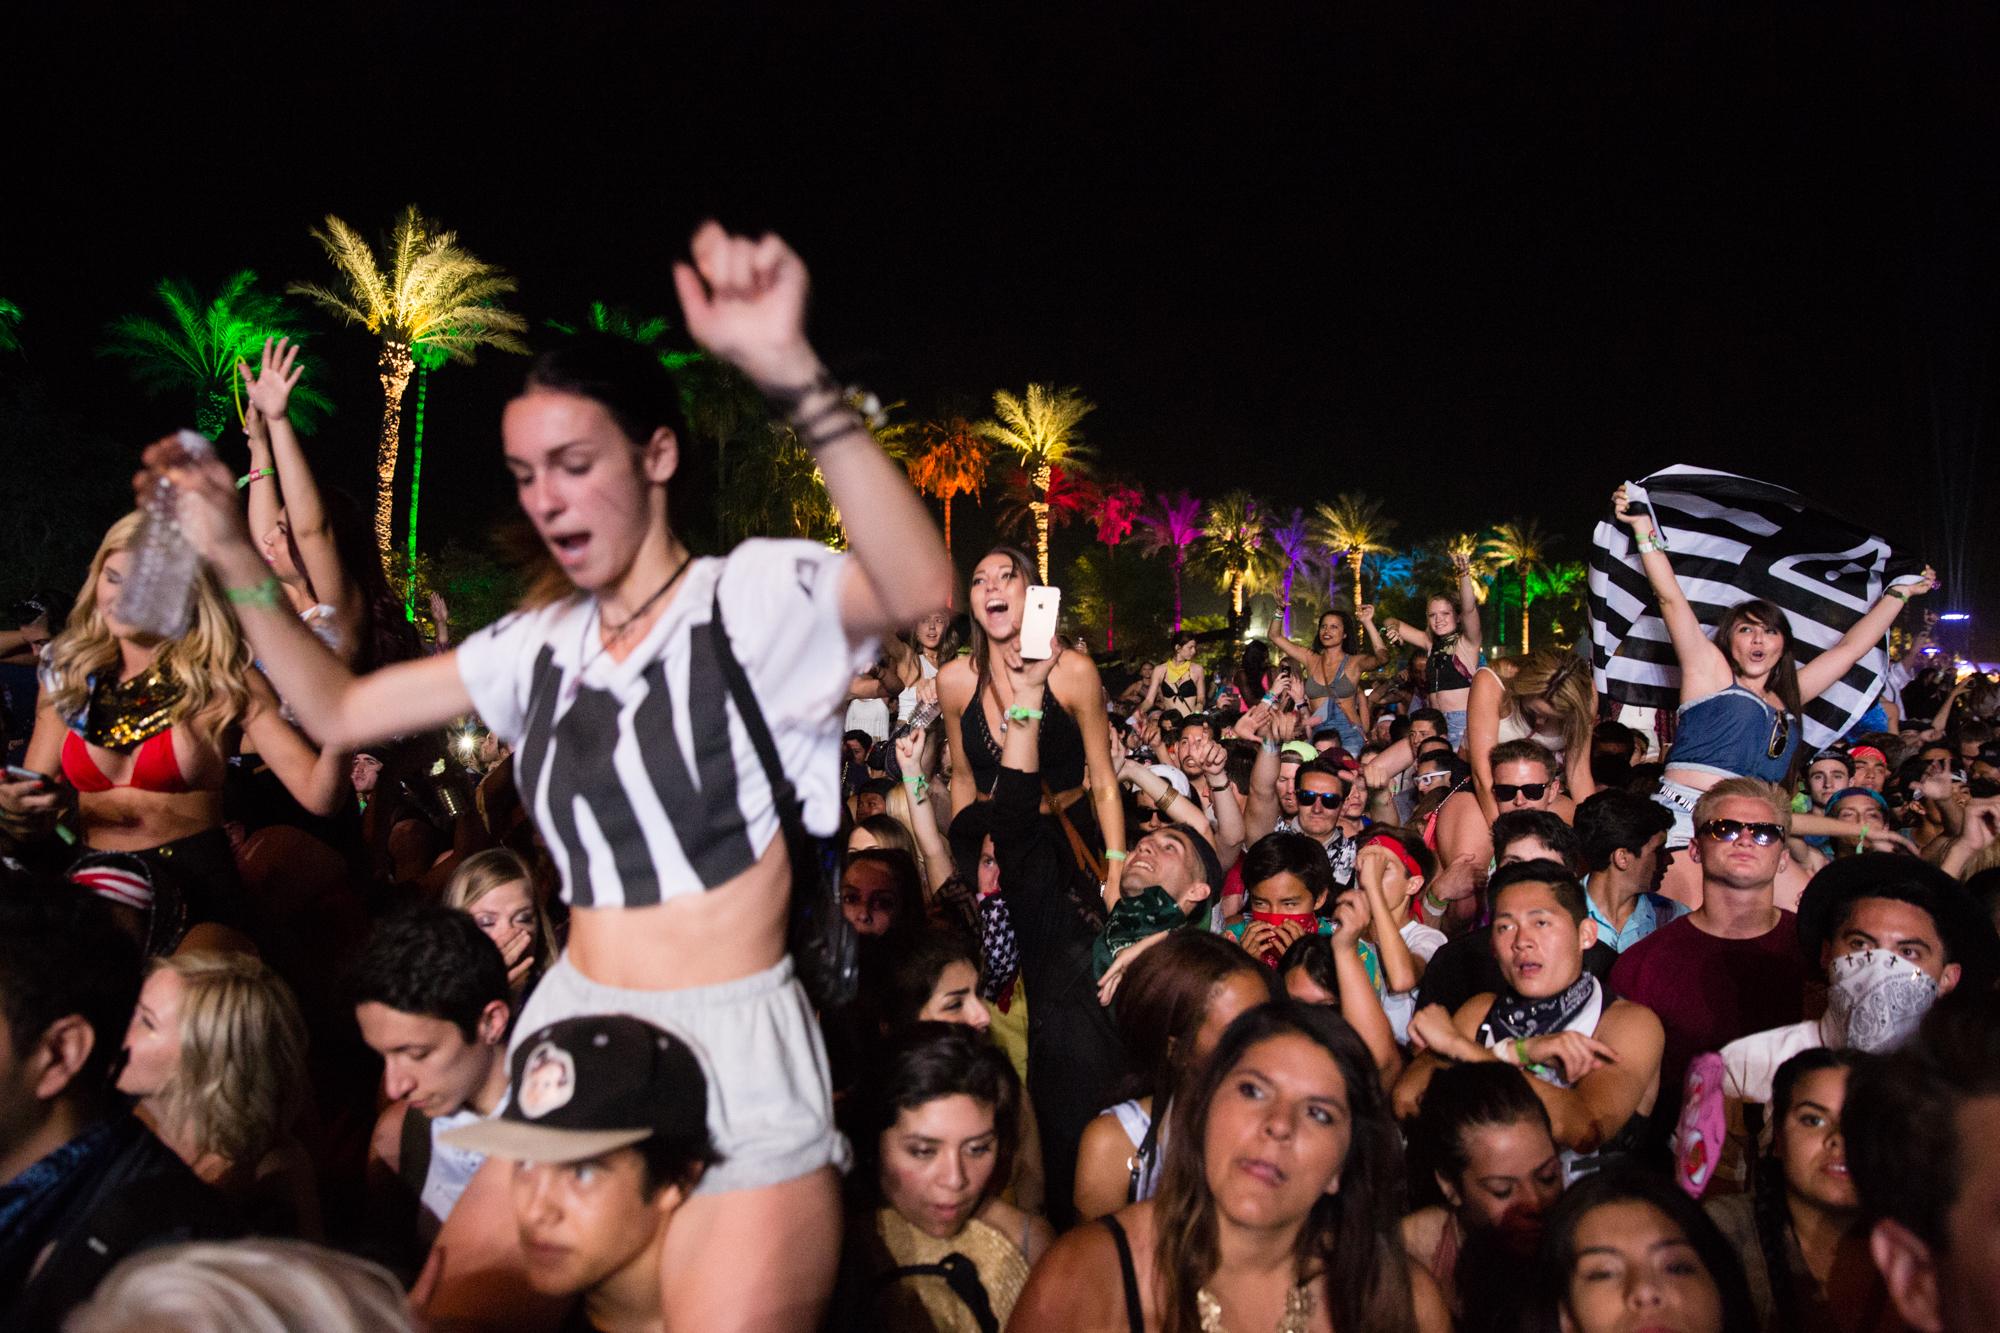 The crowd at Coachella.